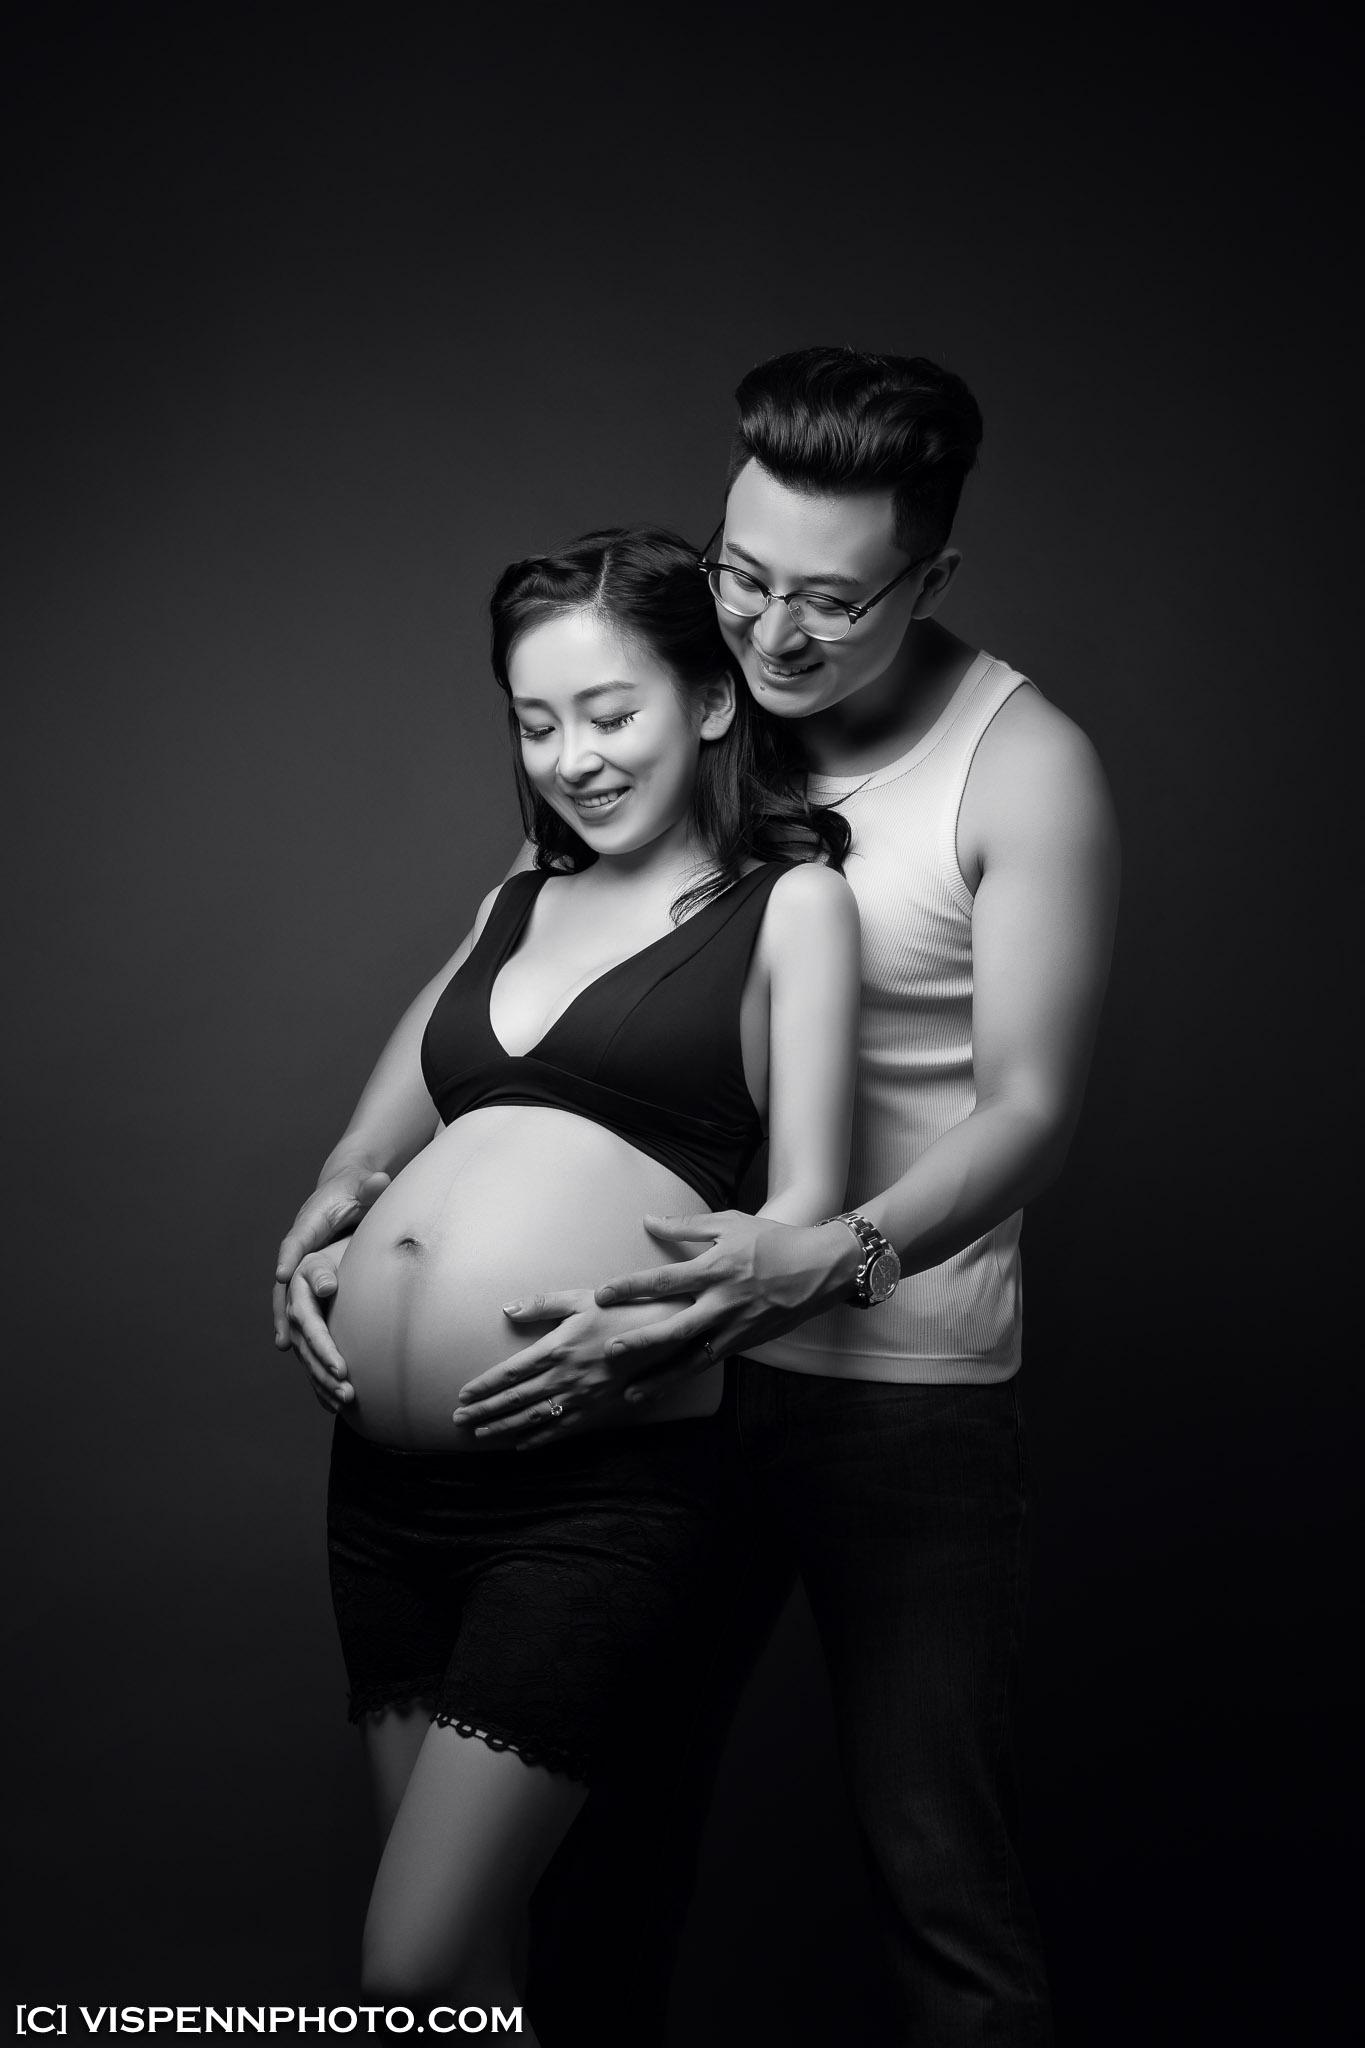 Melbourne Newborn Baby Maternity Family Photo VISPENN 墨尔本 孕妇照 大肚照 5D1 8398